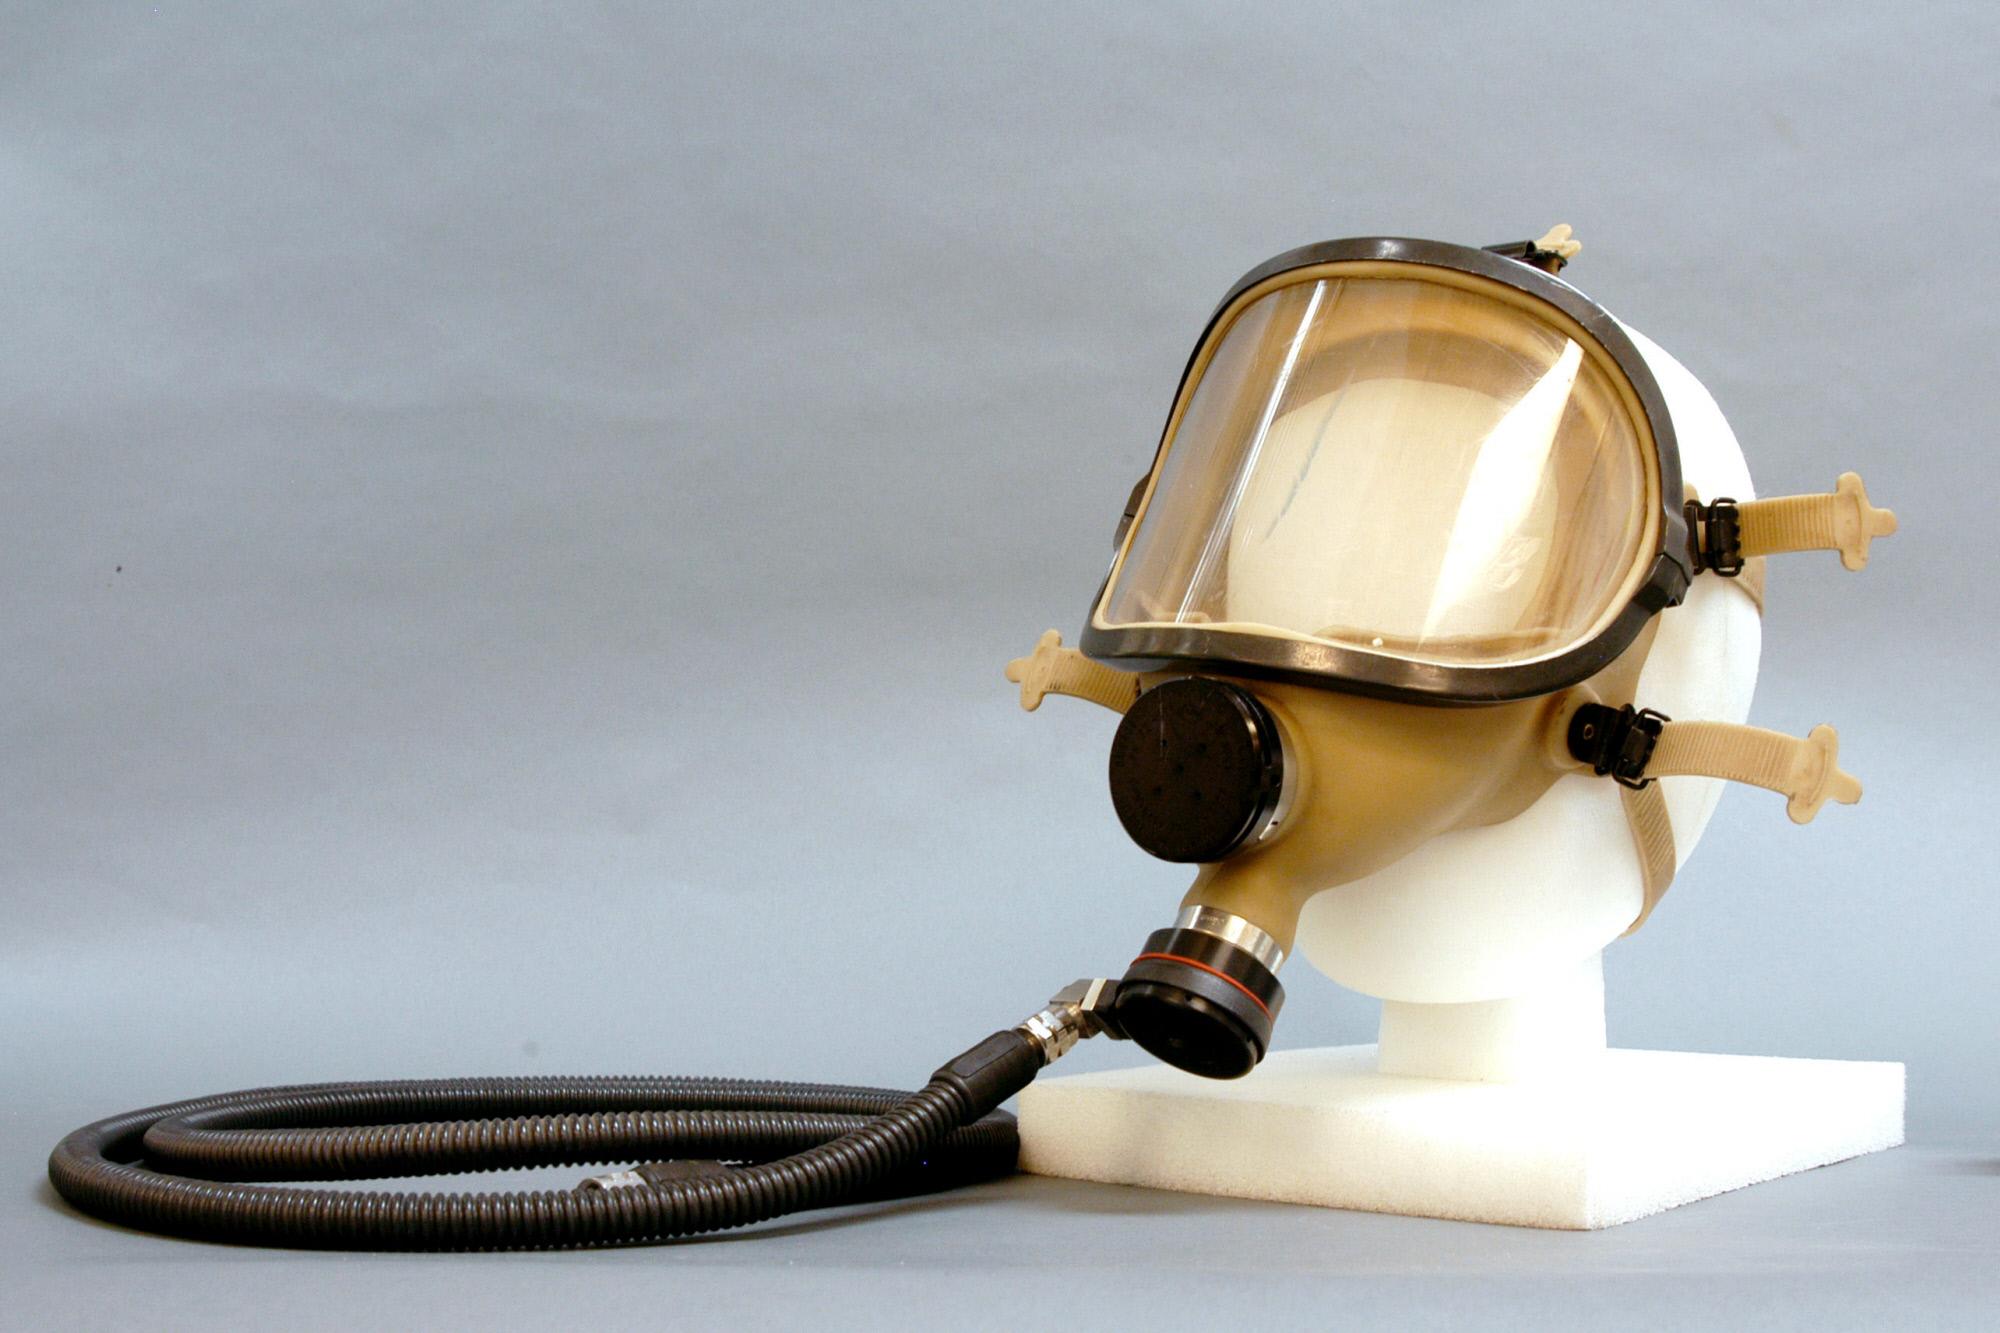 Apollo Emergency Oxygen Mask and Hose